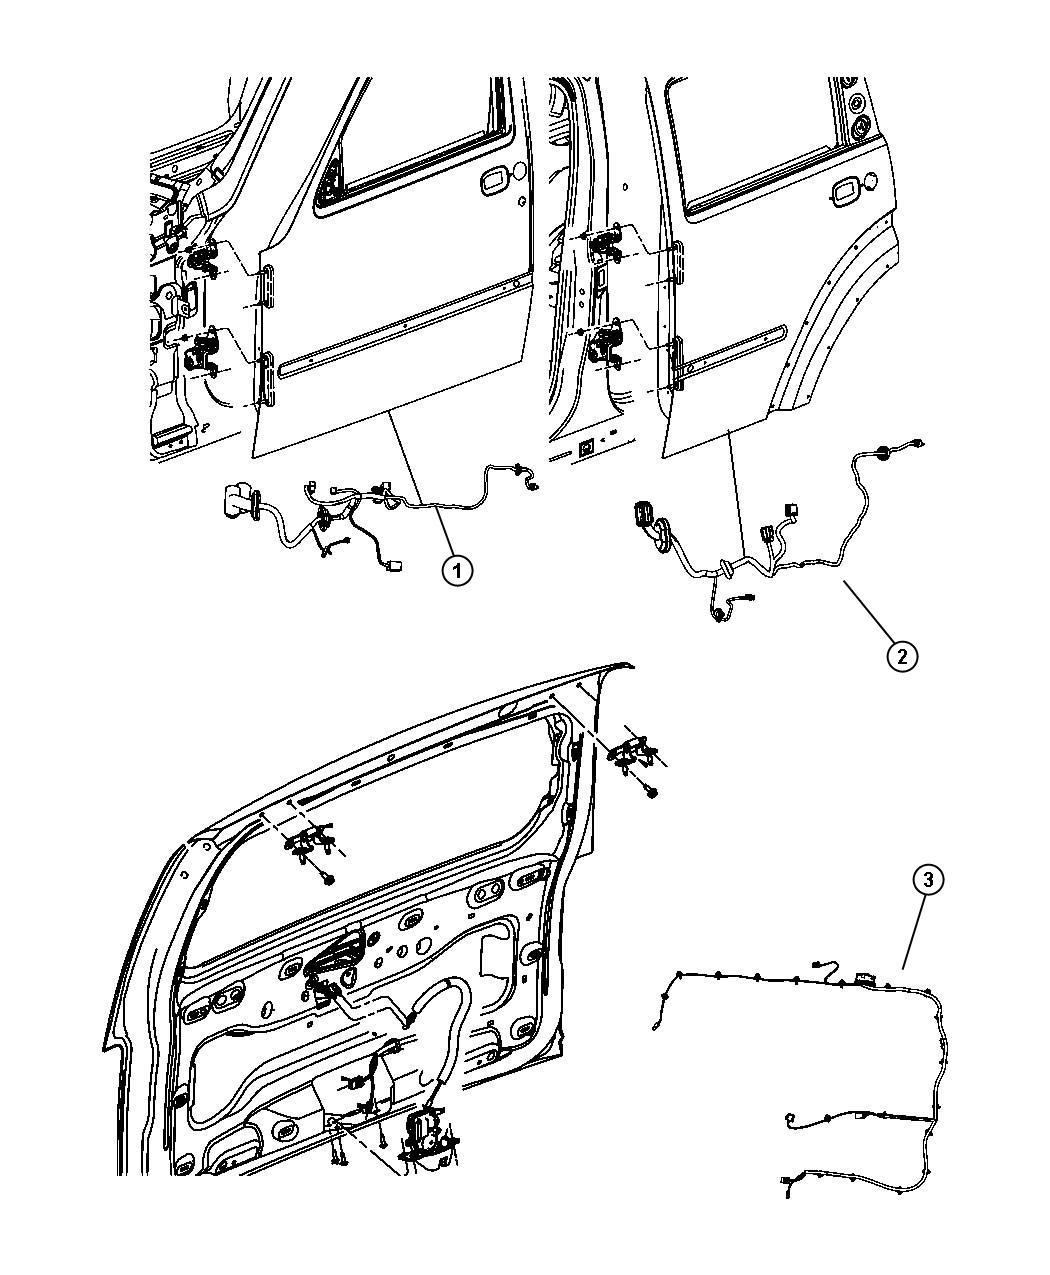 Chrysler Infinity Stereo Wiring Diagram